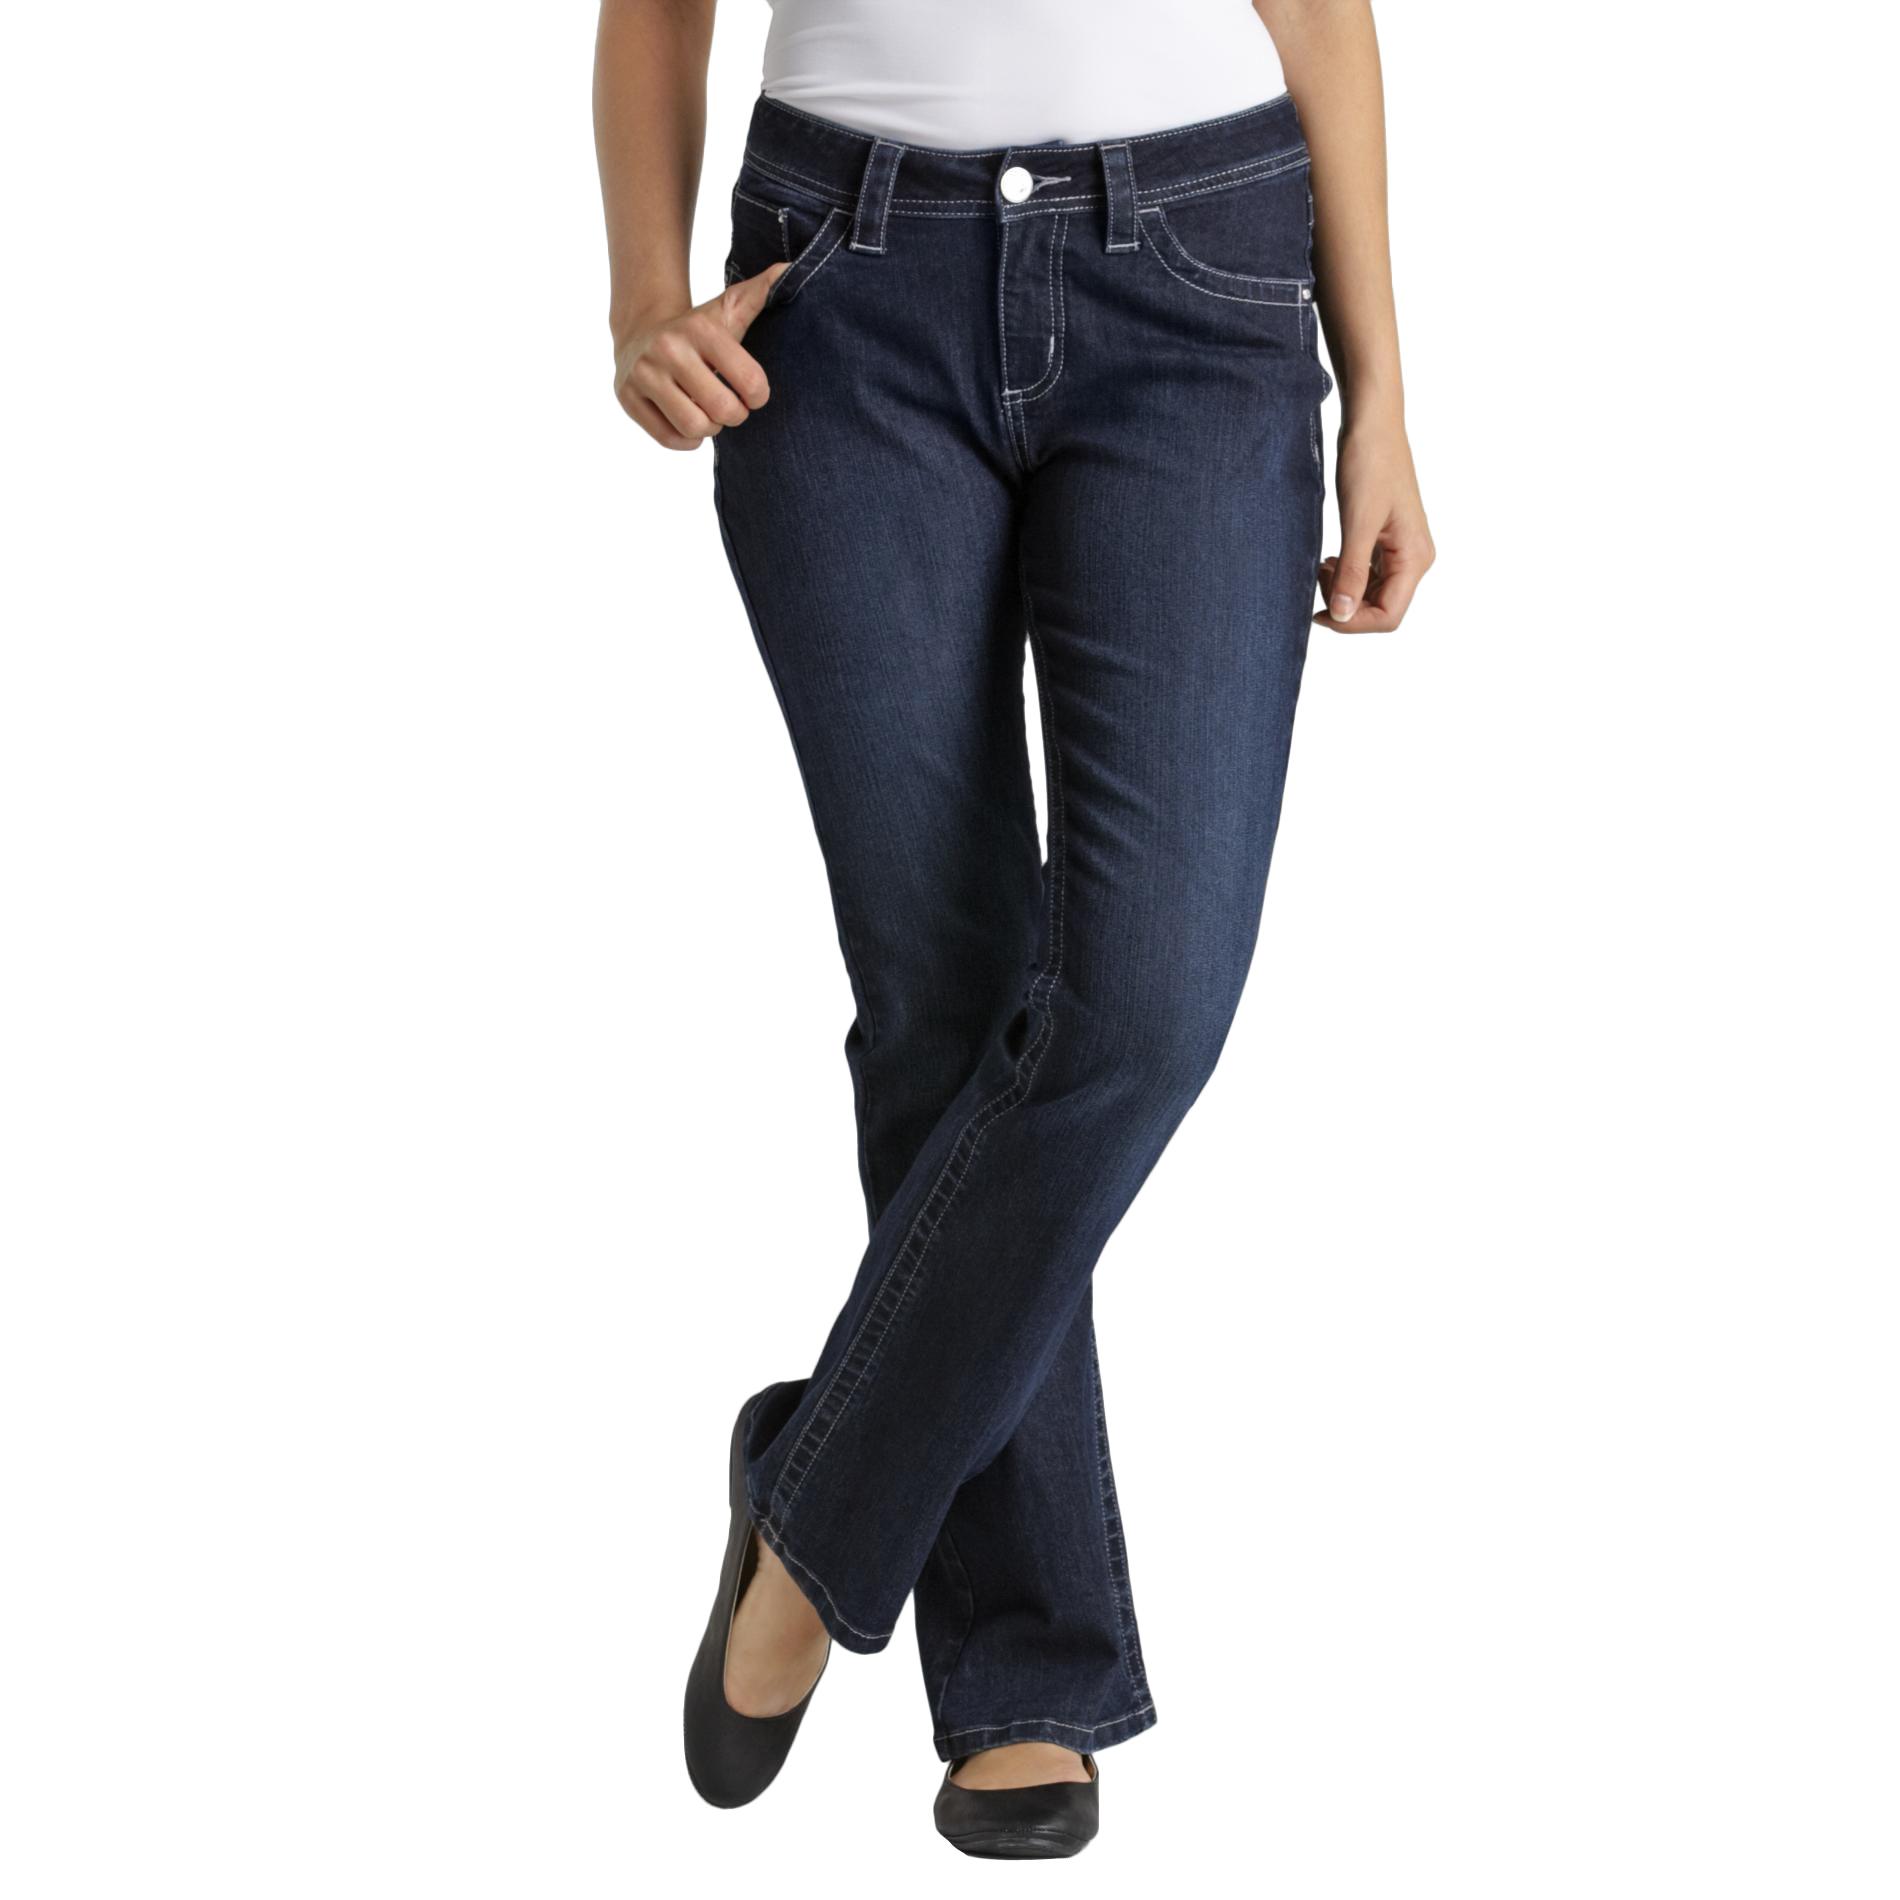 Lee Women' Curvy-fit Bootcut Jeans